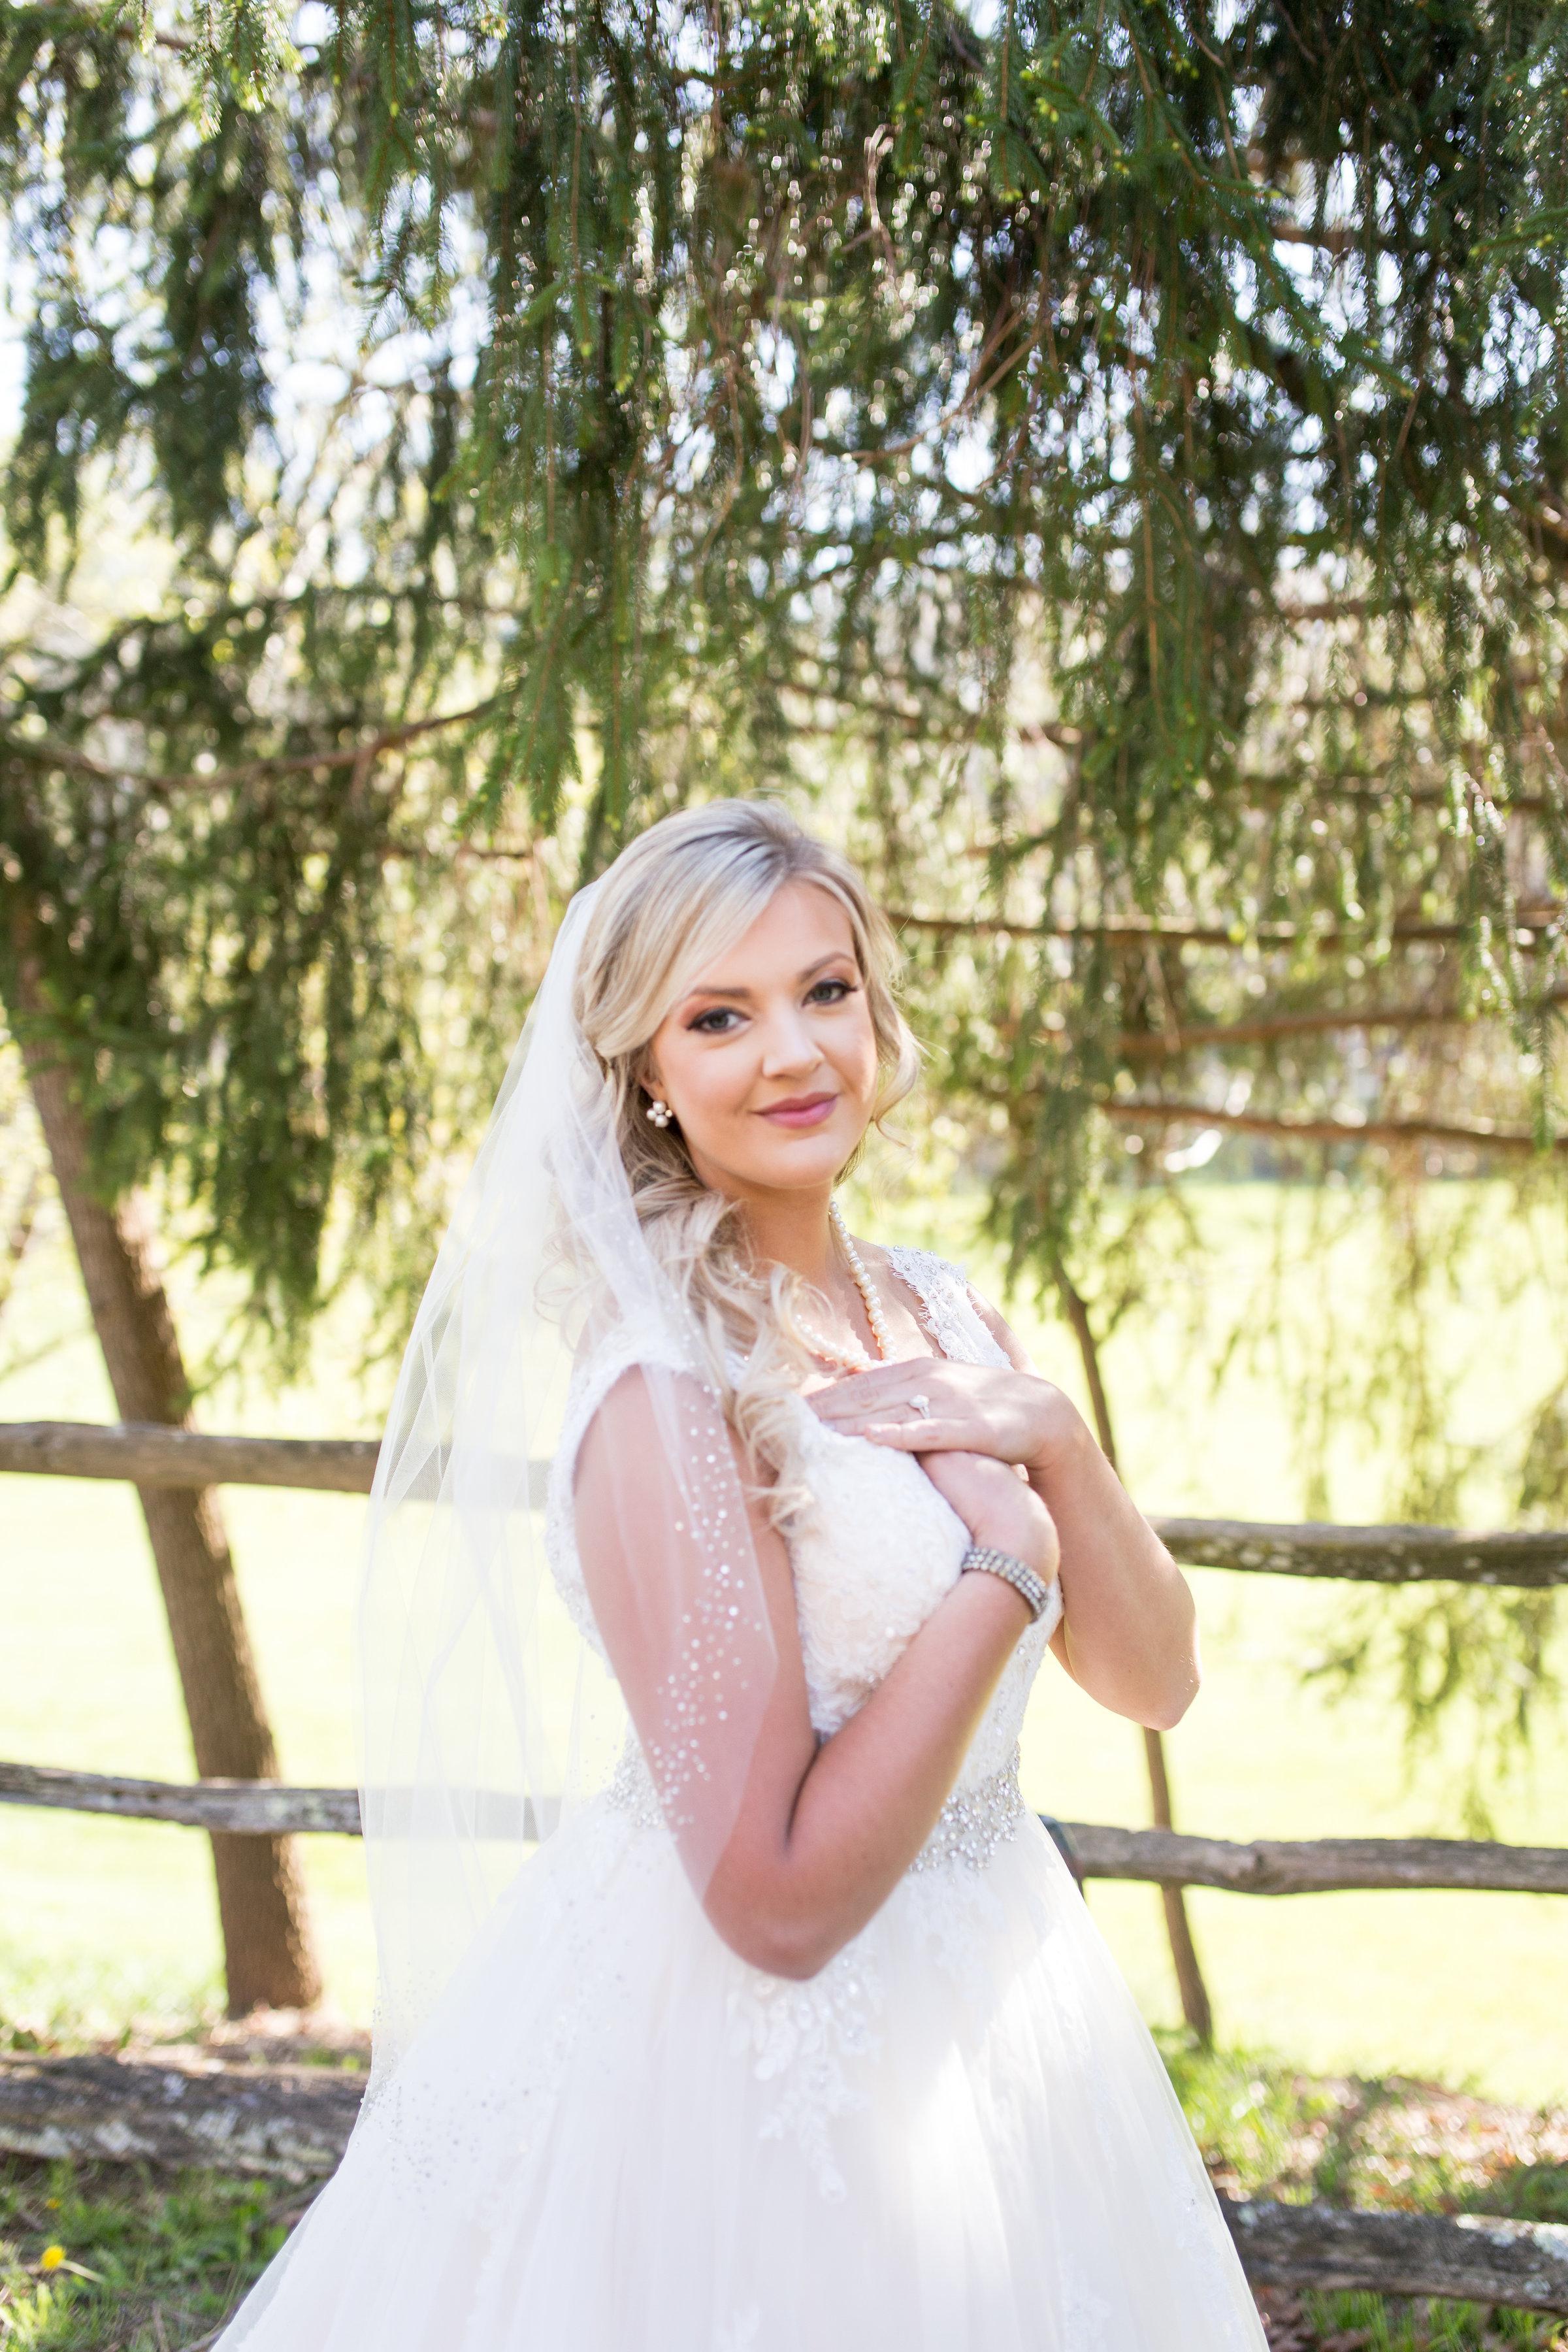 Honeysuckle-Hill-Asheville-Wedding-Venue-Ann-Cordell-Bridal-63.JPG